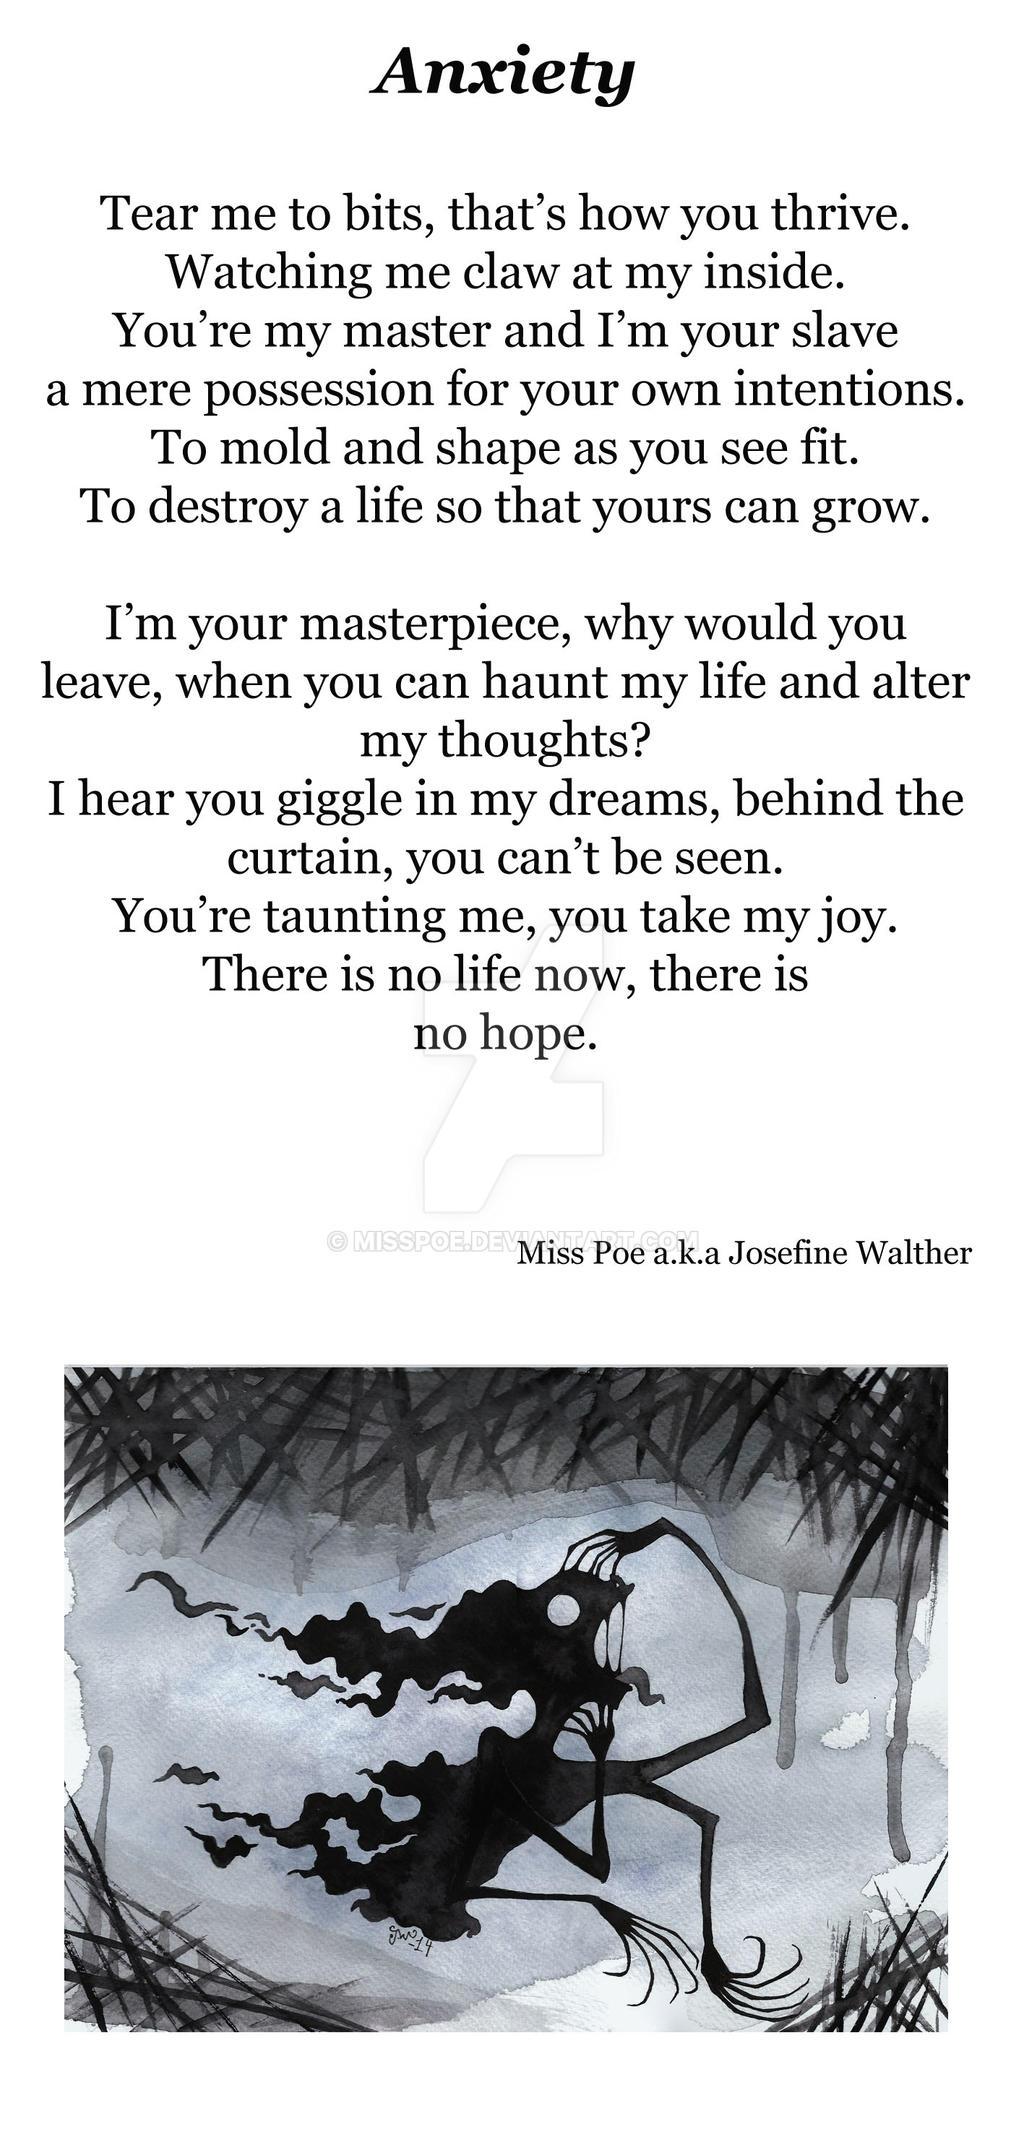 Anxiety - poem